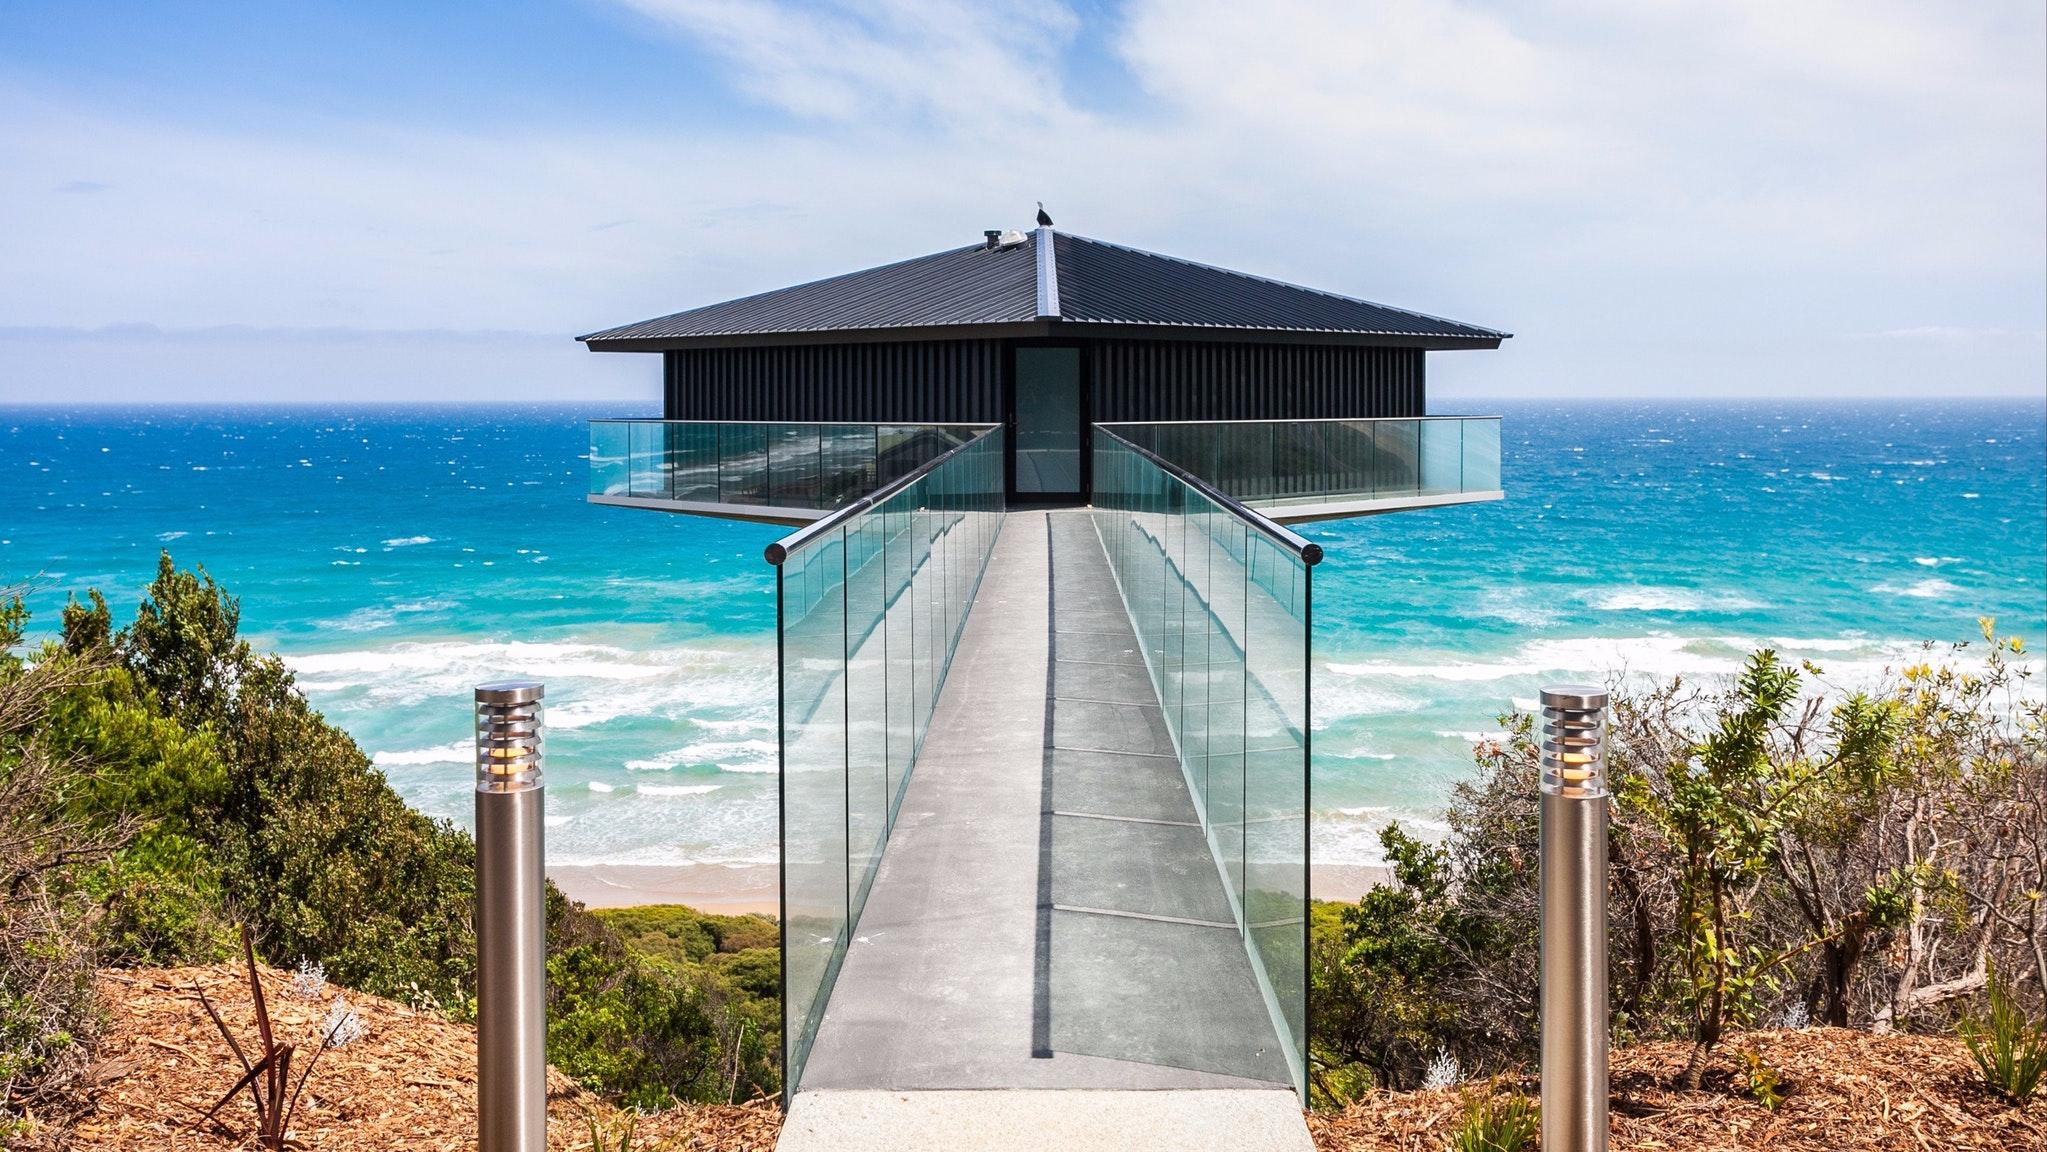 great ocean road holidays accommodation great ocean road. Black Bedroom Furniture Sets. Home Design Ideas